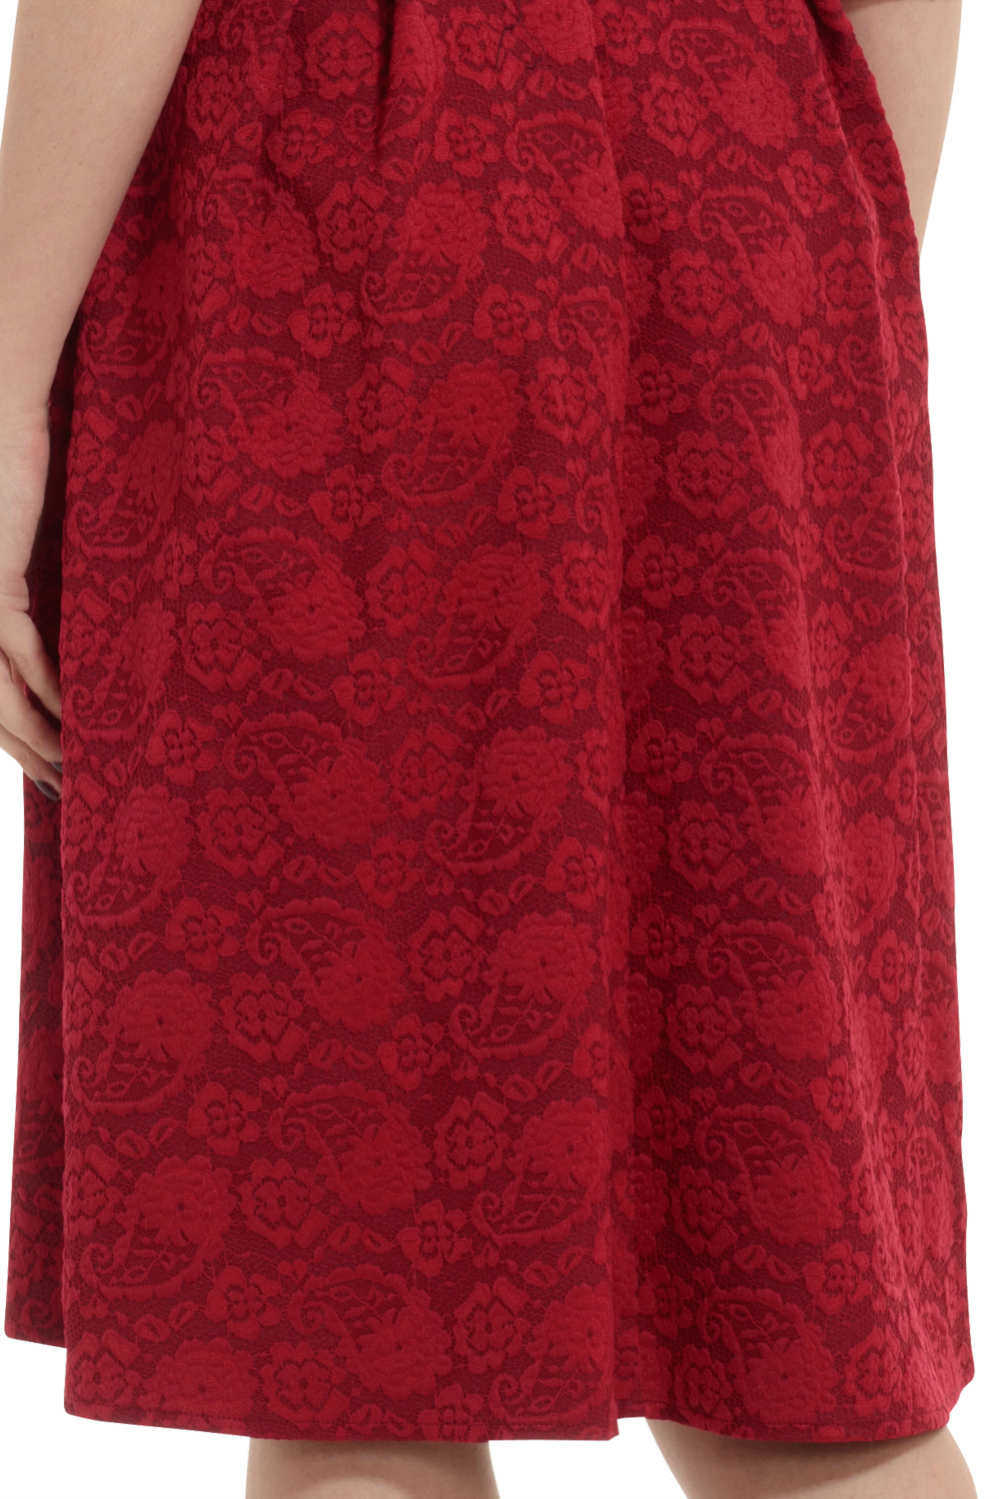 Vixen 50s Jane Jacquard Swing Dress in Burgundy Red